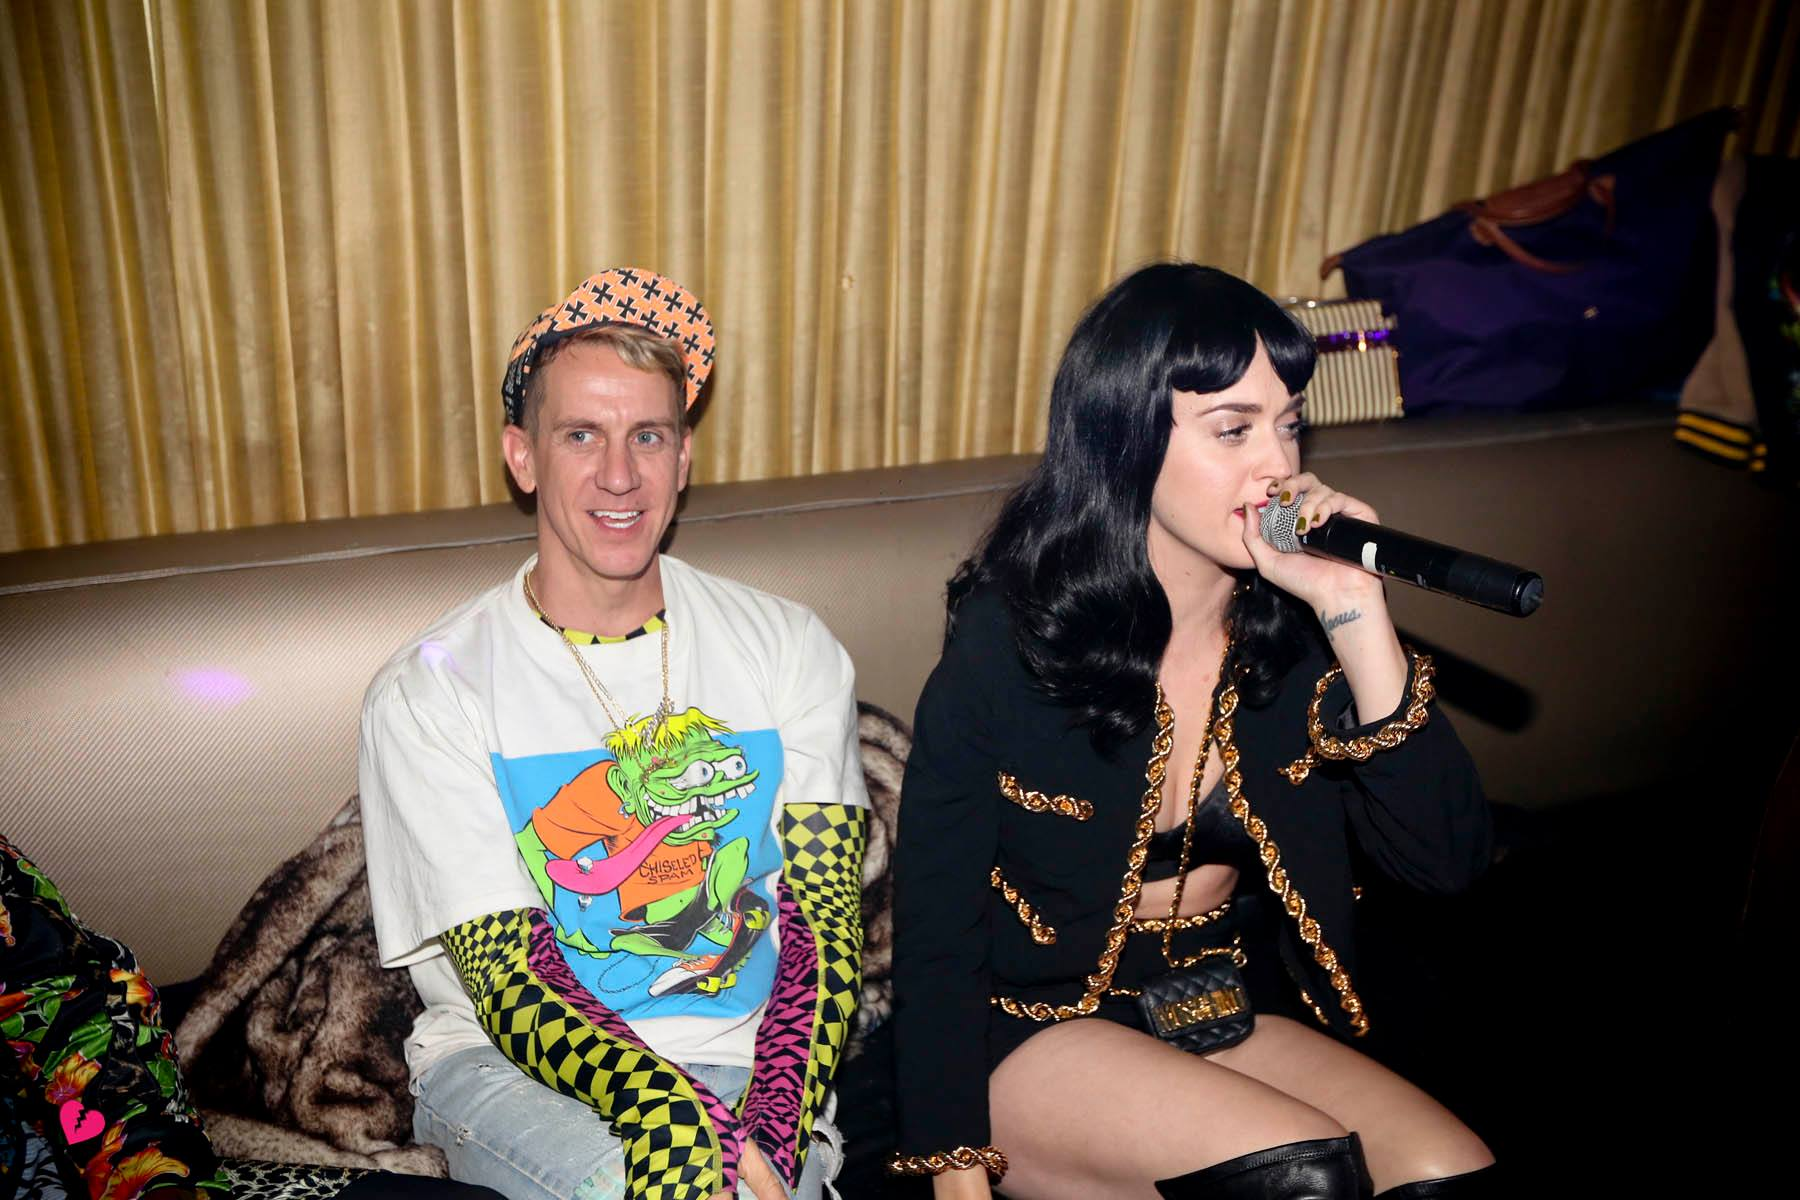 Katy Perry talked into a microphone alongside friend and designer Jeremy Scott. Source: Facebook user 1 Oak NY